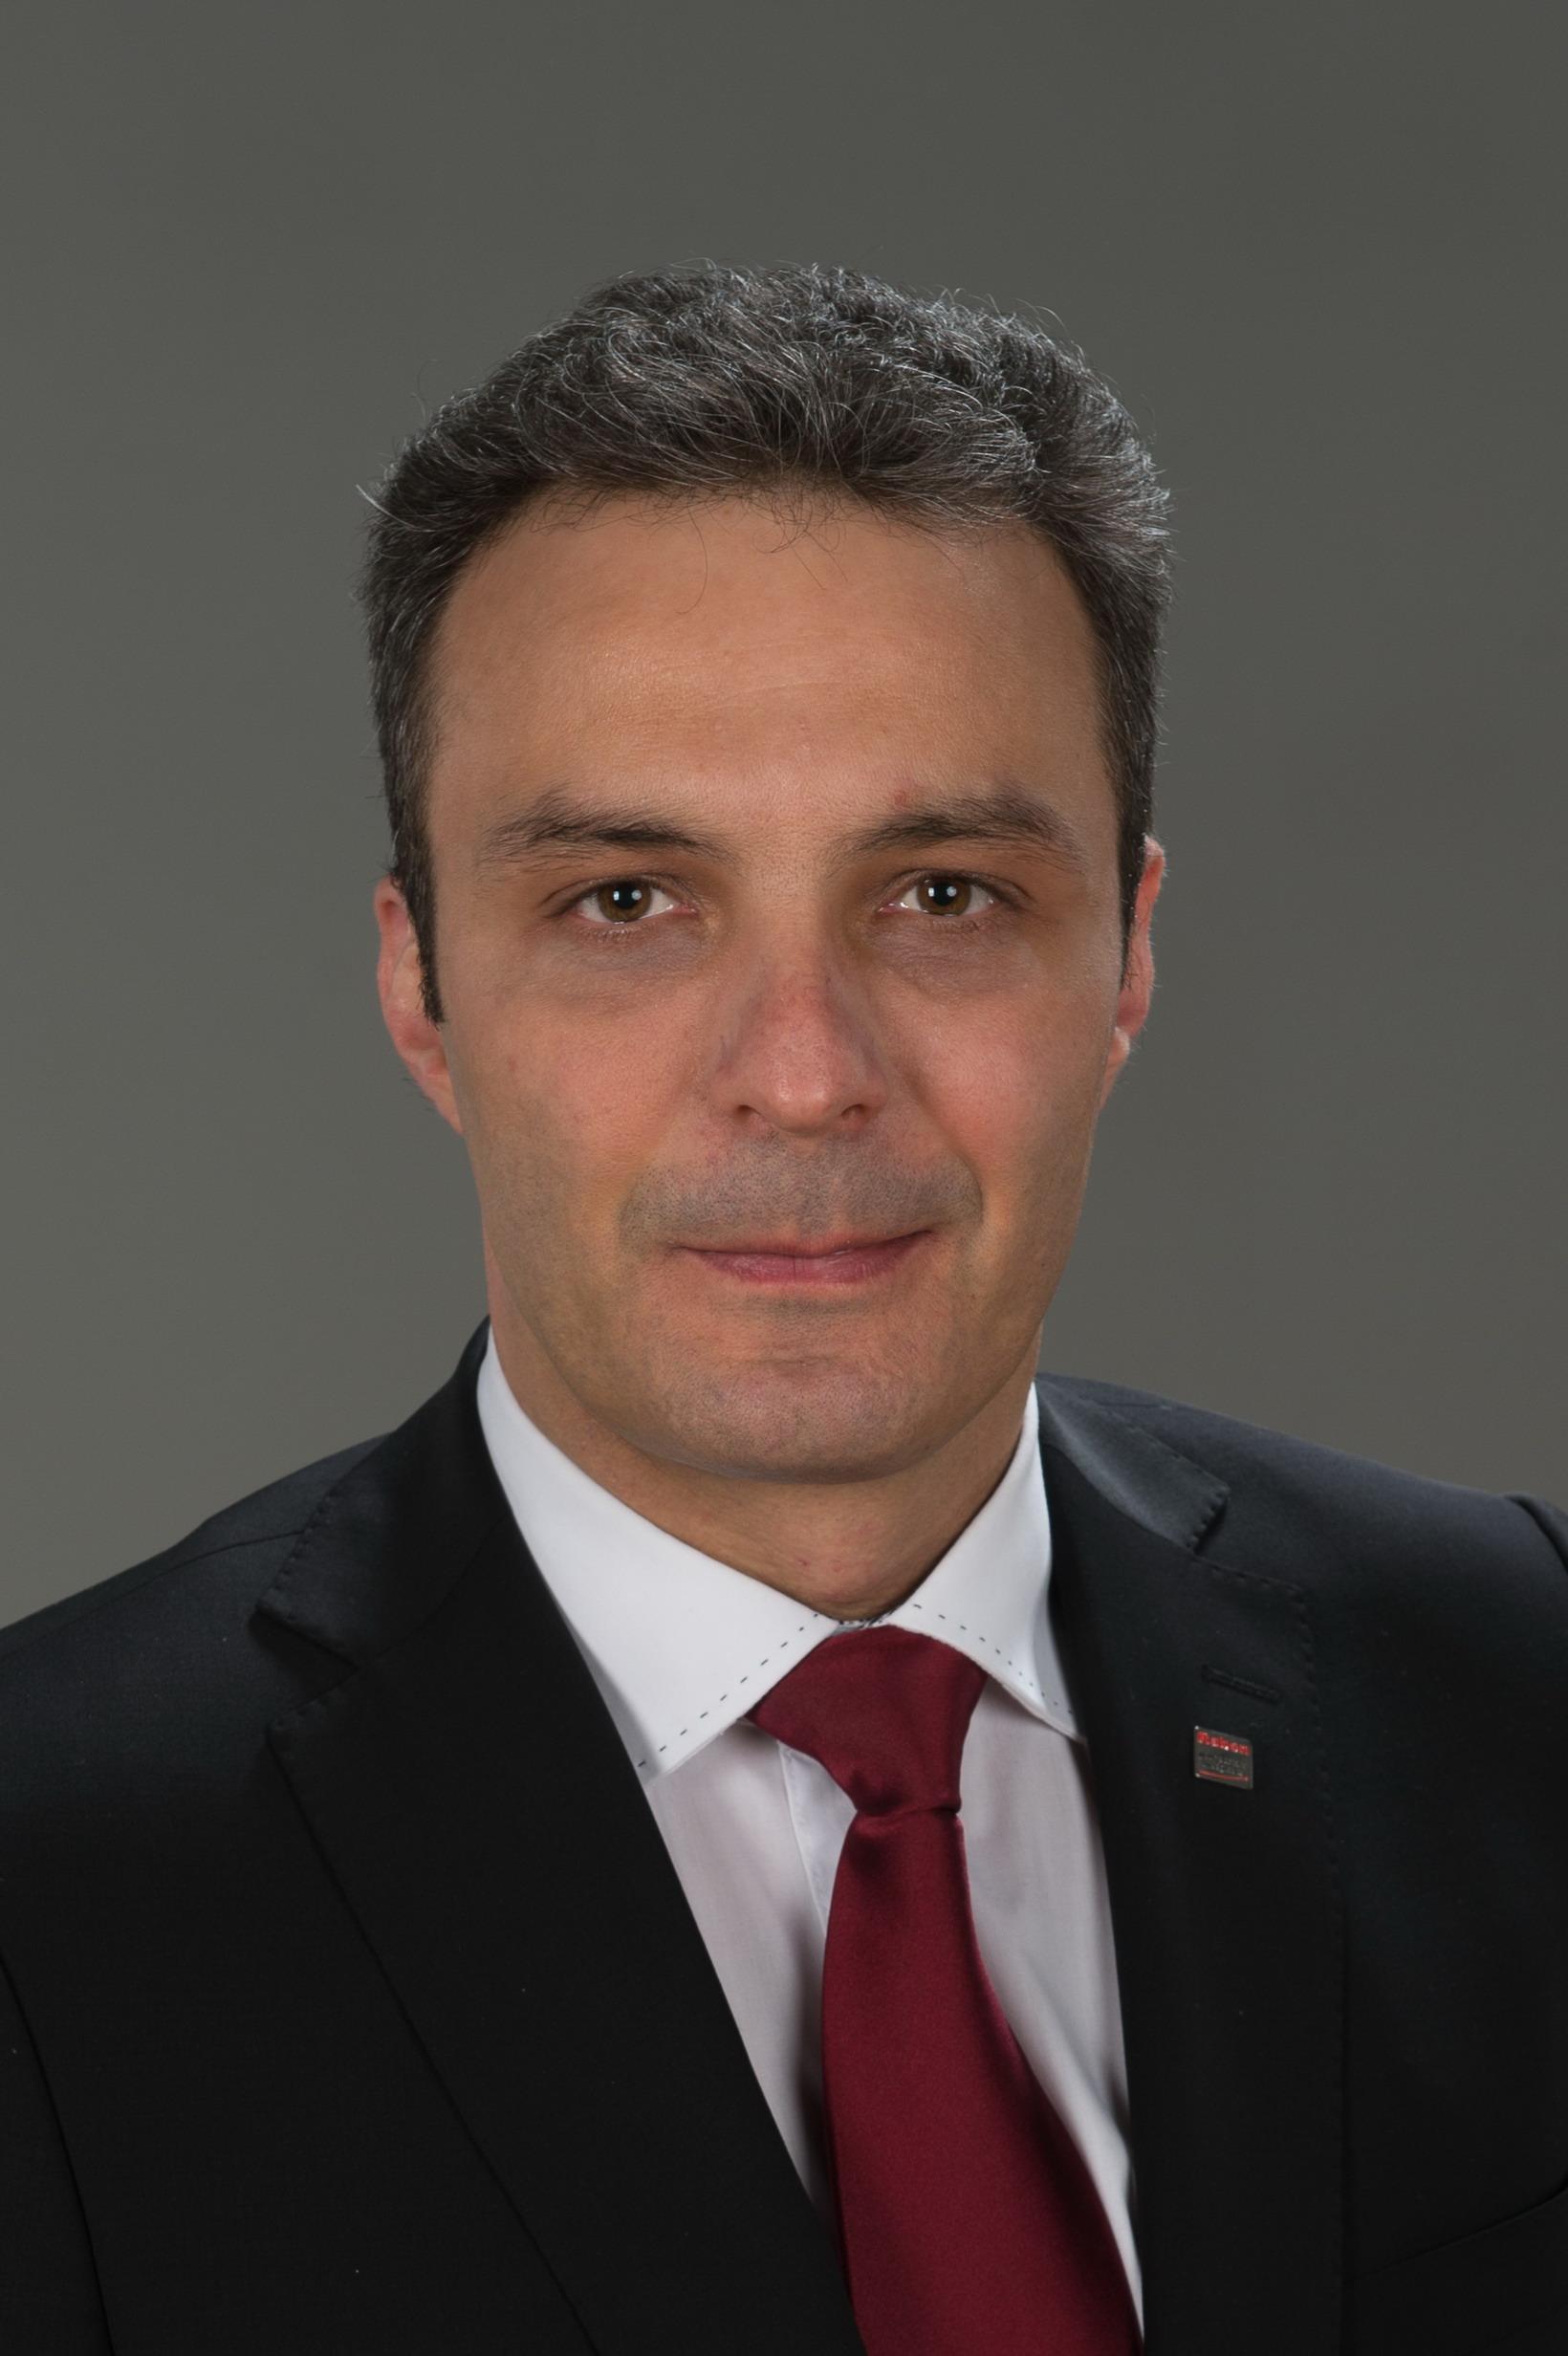 Slawomir Blotny, Business Development Director, Raben Group